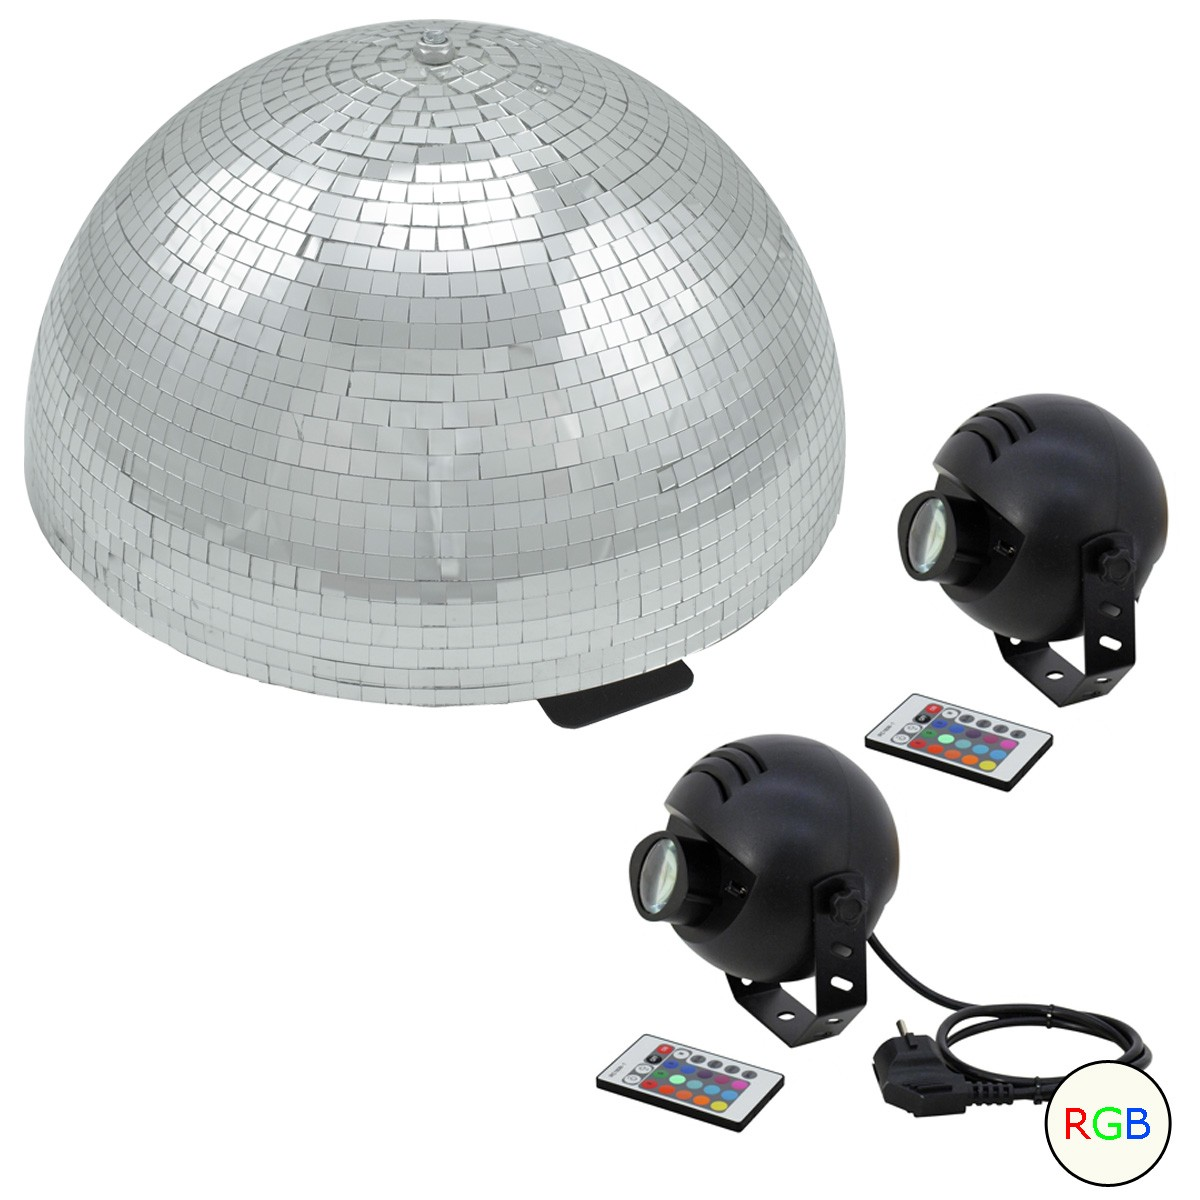 Set Halbspiegelkugel 40cm + 2 x LED Pinspot Farbwechsel RGB